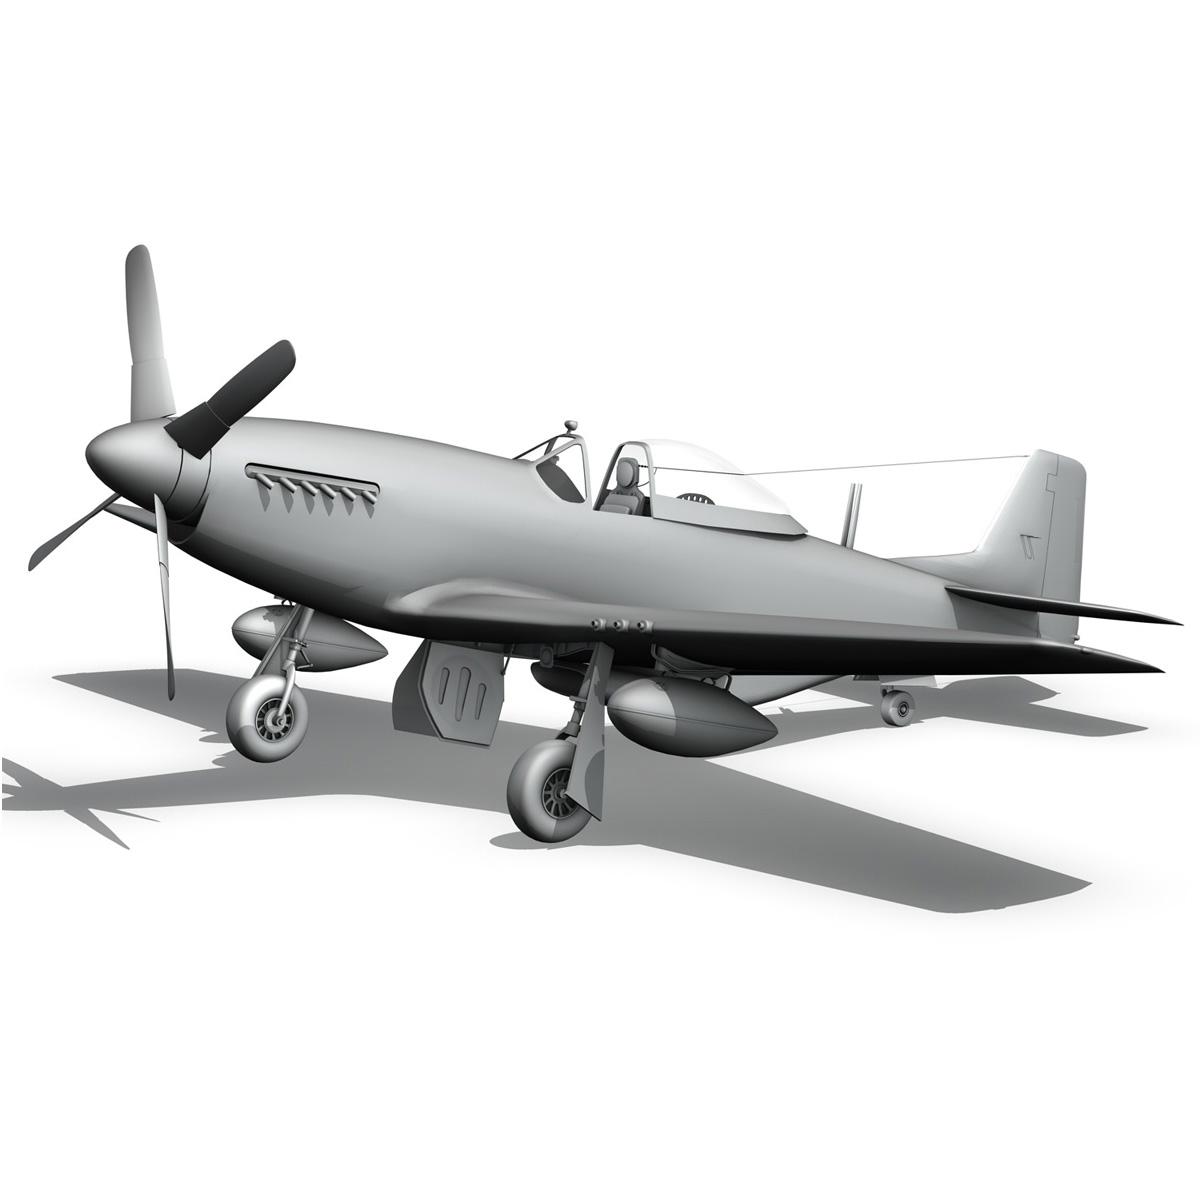 North American P-51D - Geraldine 3d model fbx c4d lwo obj 265954